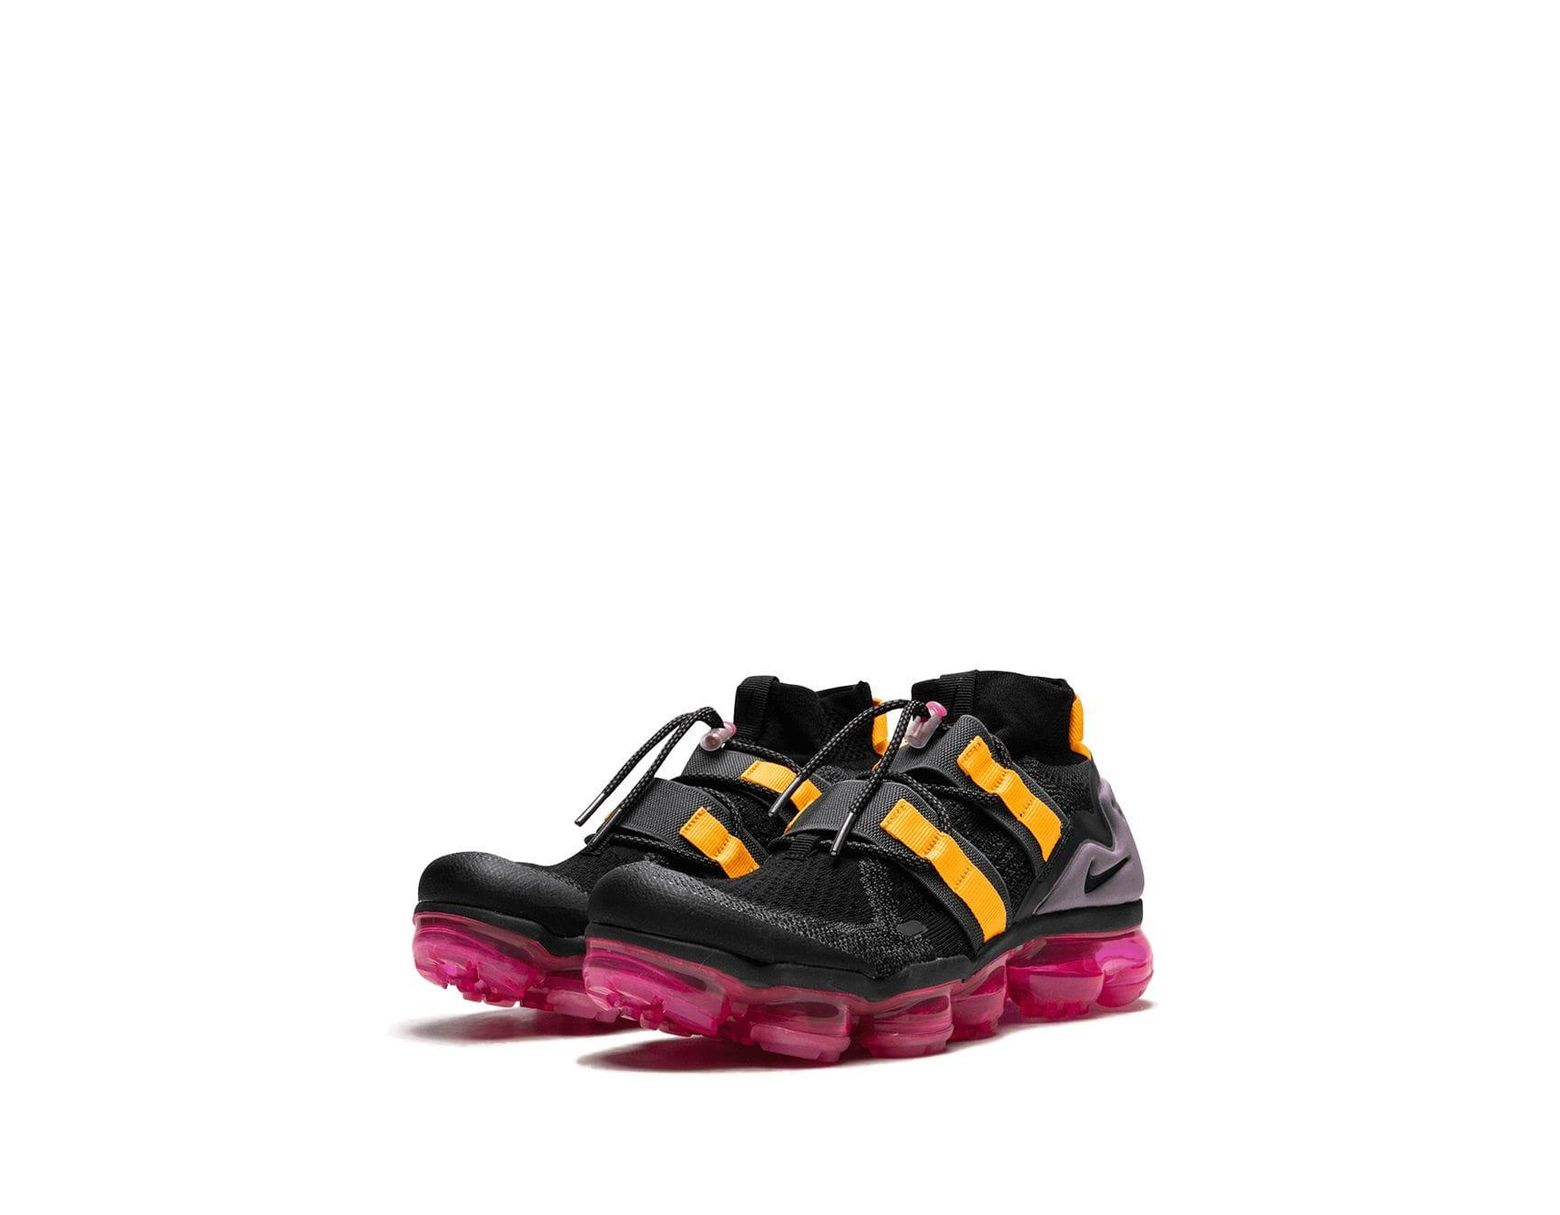 ab622bcadb Nike Vapormax Fk Utility Sneakers for Men - Lyst